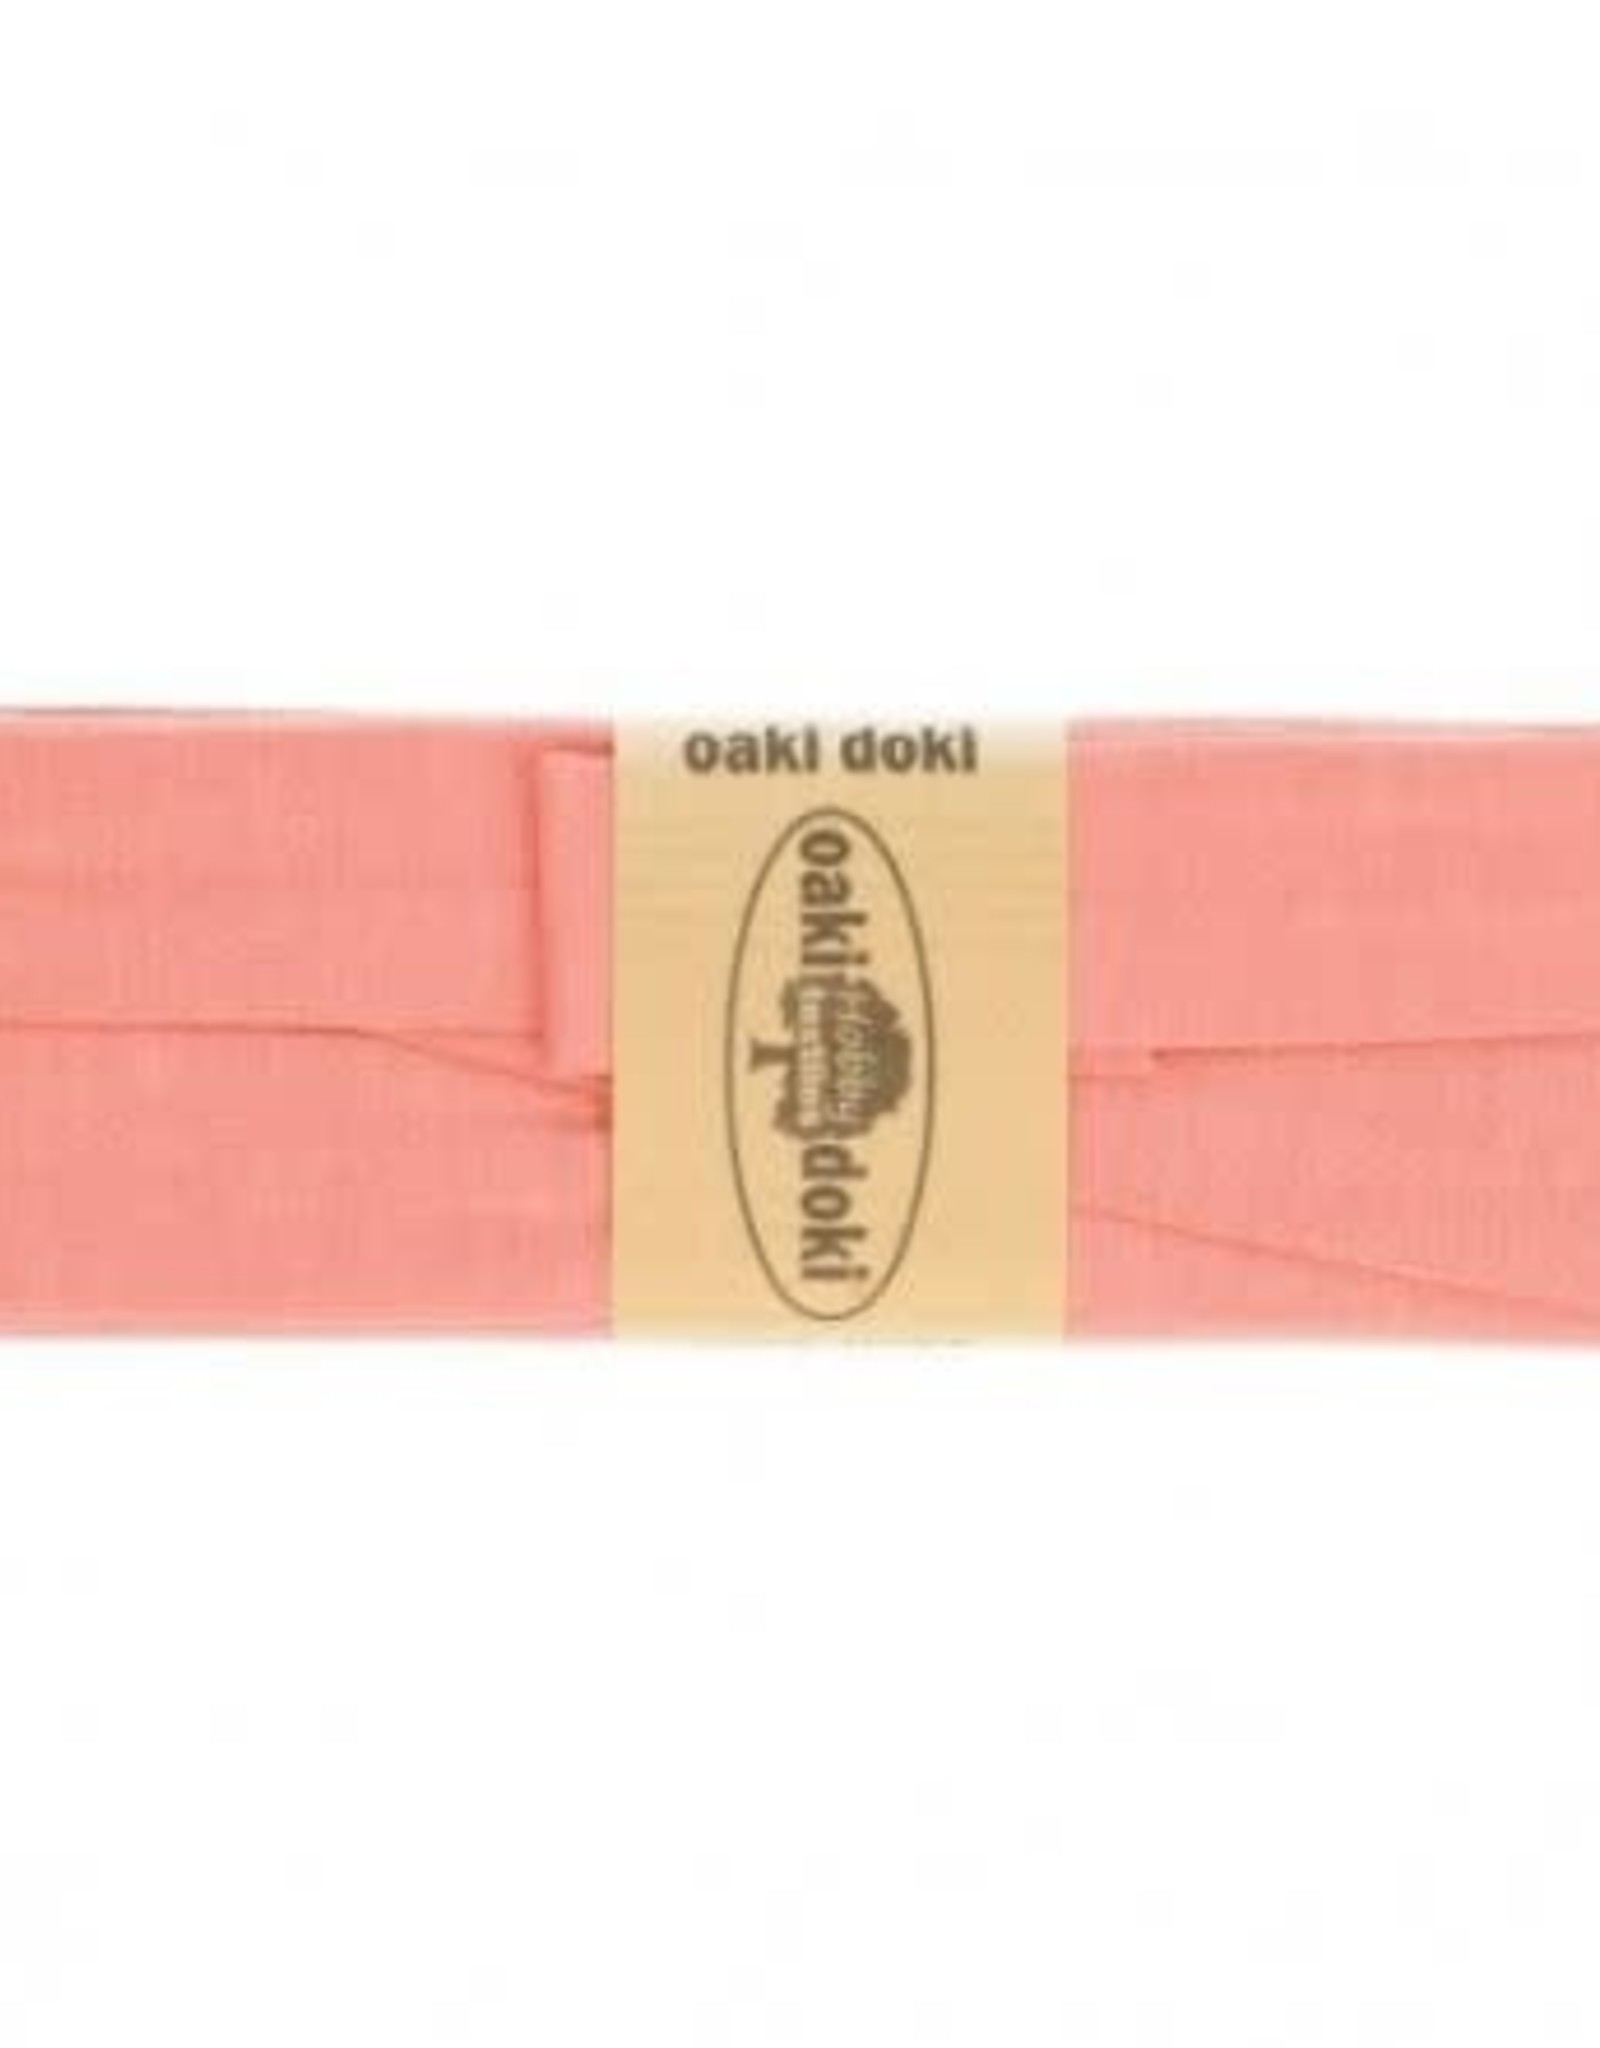 Oaki Doki Biais tricot de luxe Oaki Doki  zalm 133